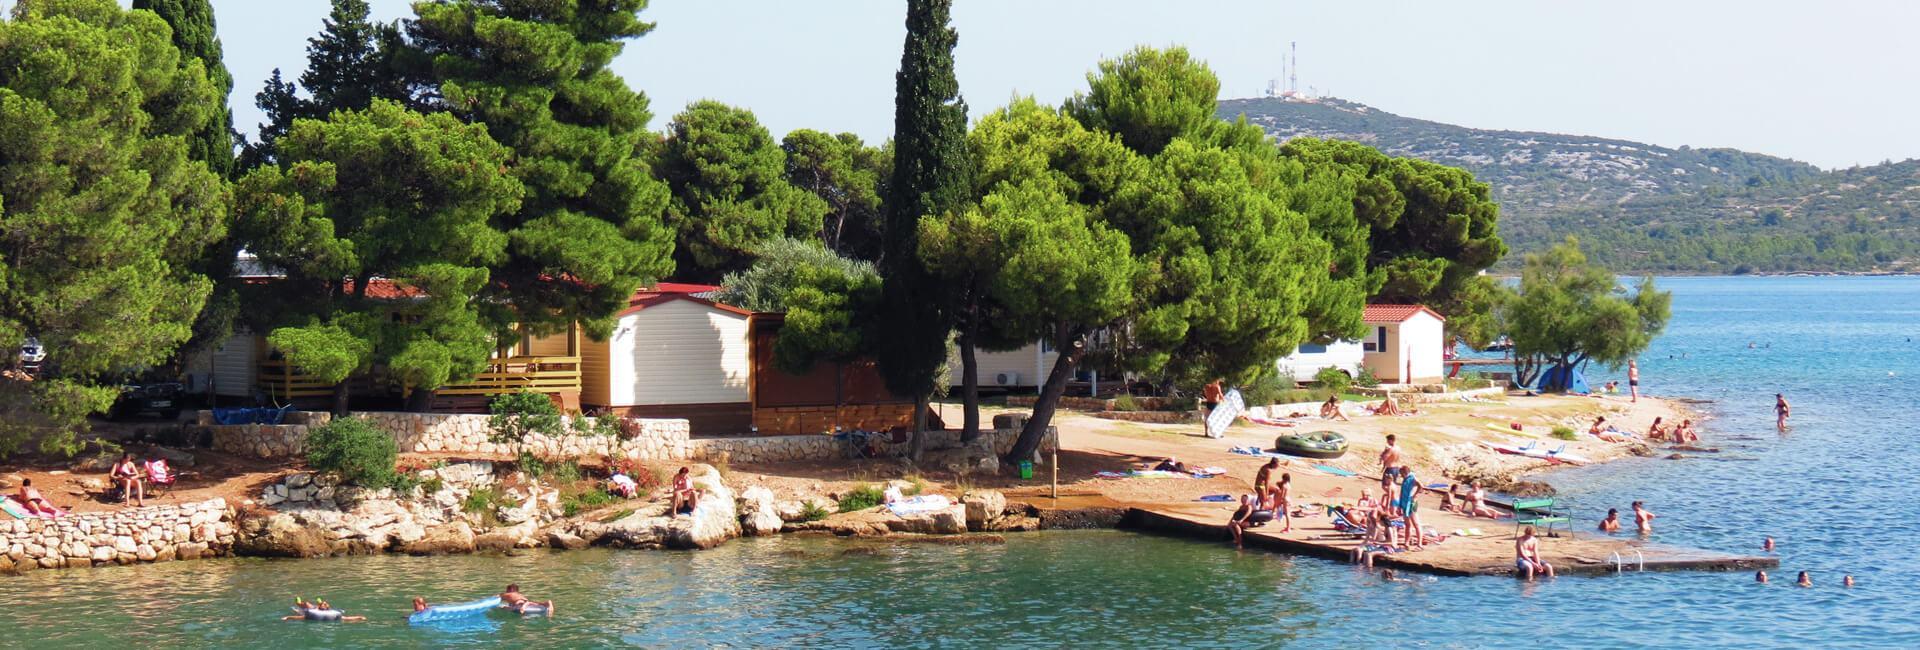 Camping Miran Pirovac Strand